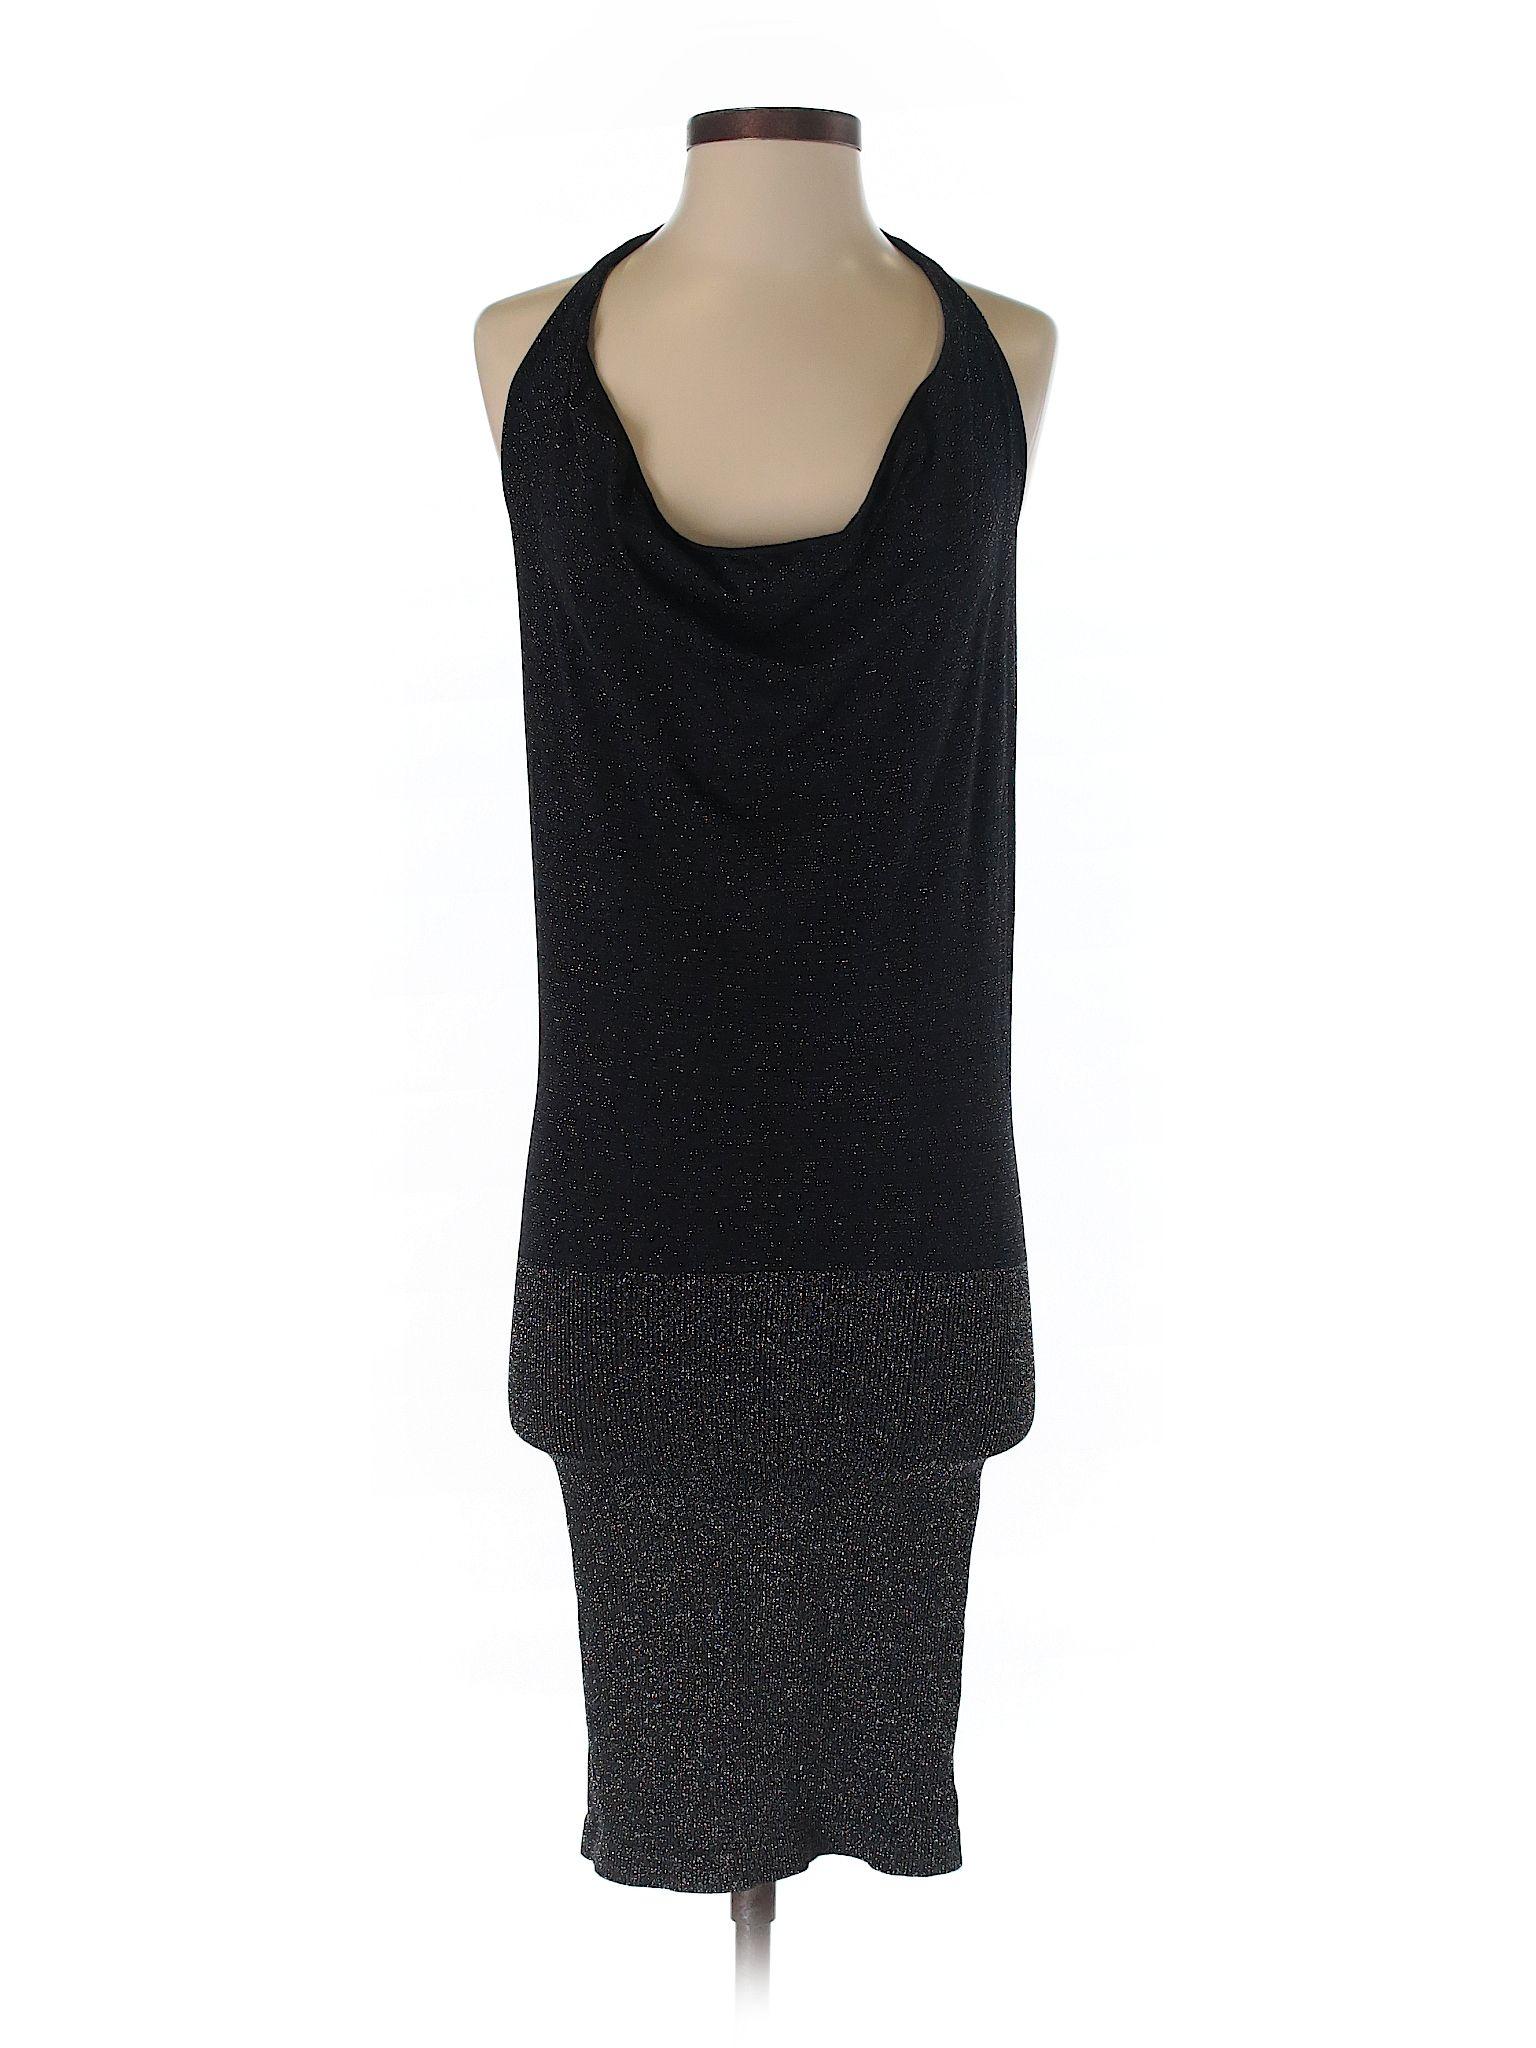 Bebe Cocktail Dress Size 400 Black Womens Dresses  $3899